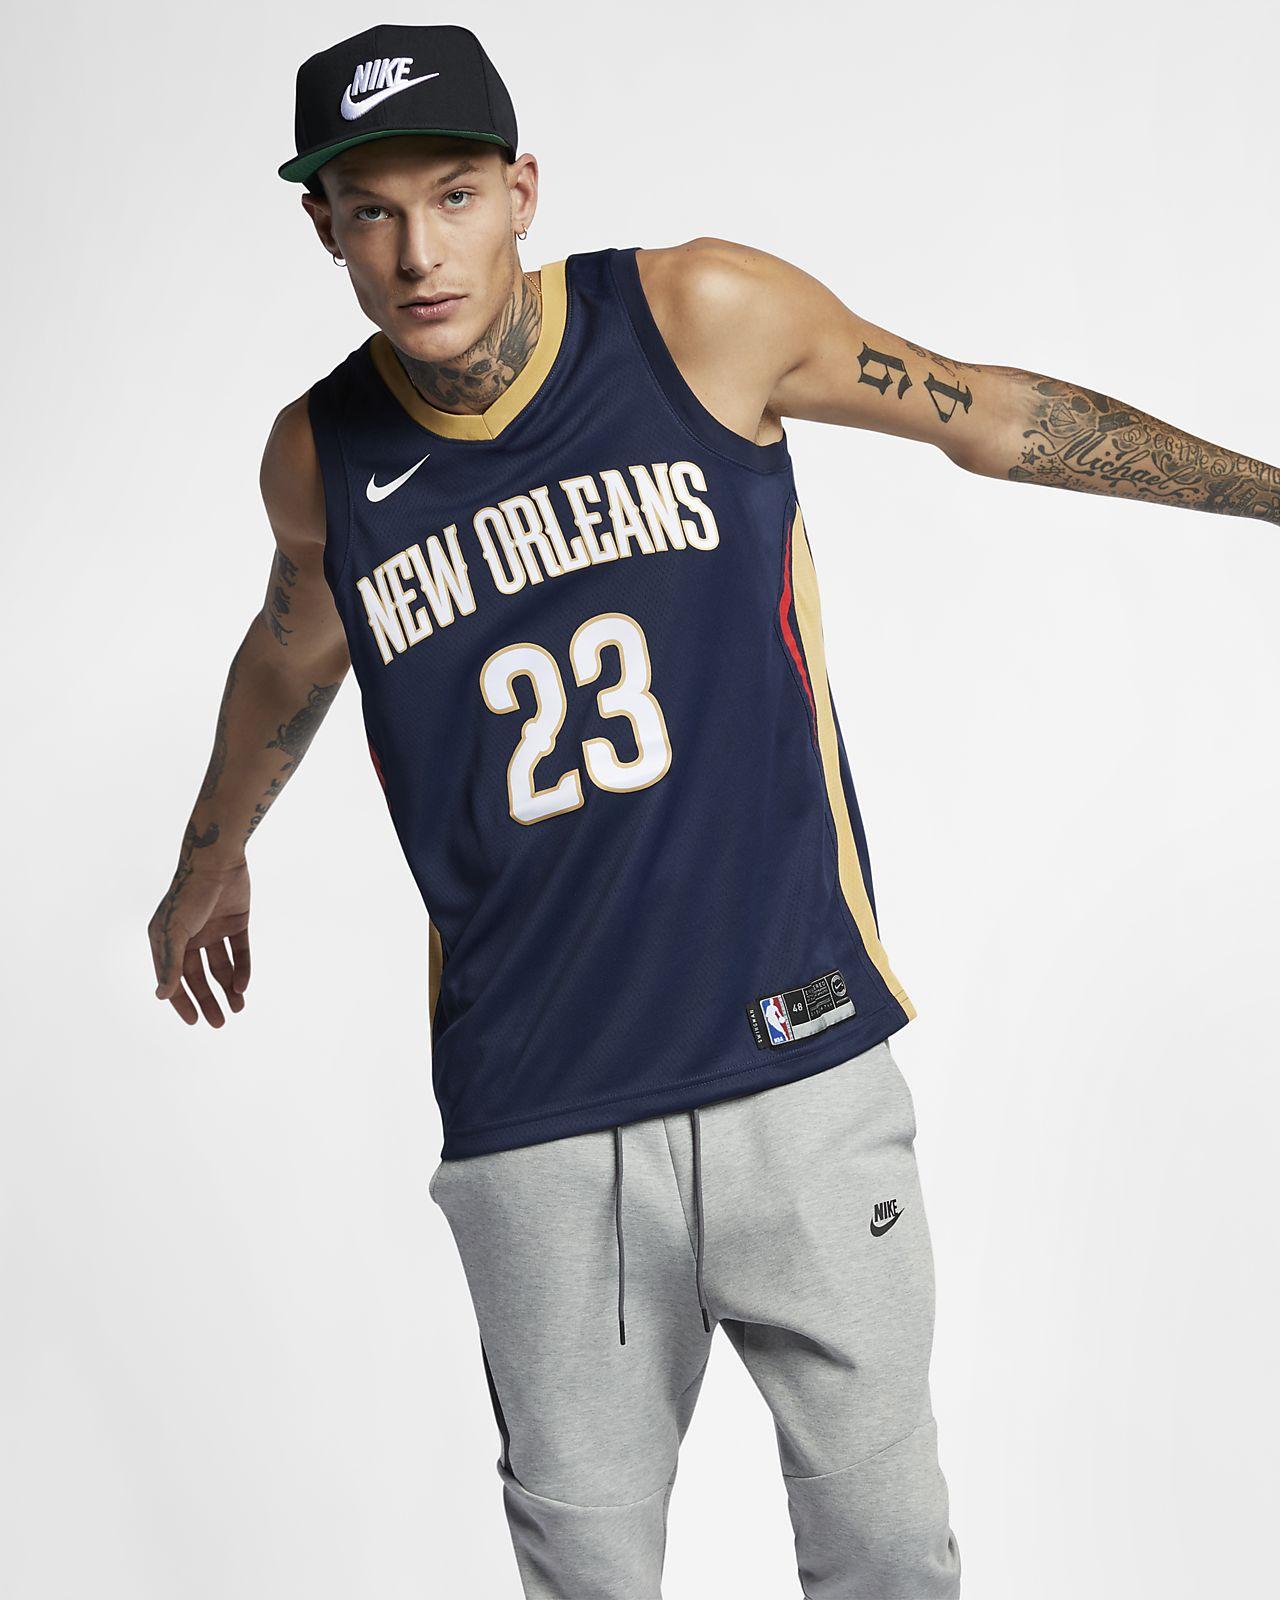 Maillot connecté Nike NBA Anthony Davis (NBA) Icon Edition Swingman (New Orleans Pelicans) pour Homme